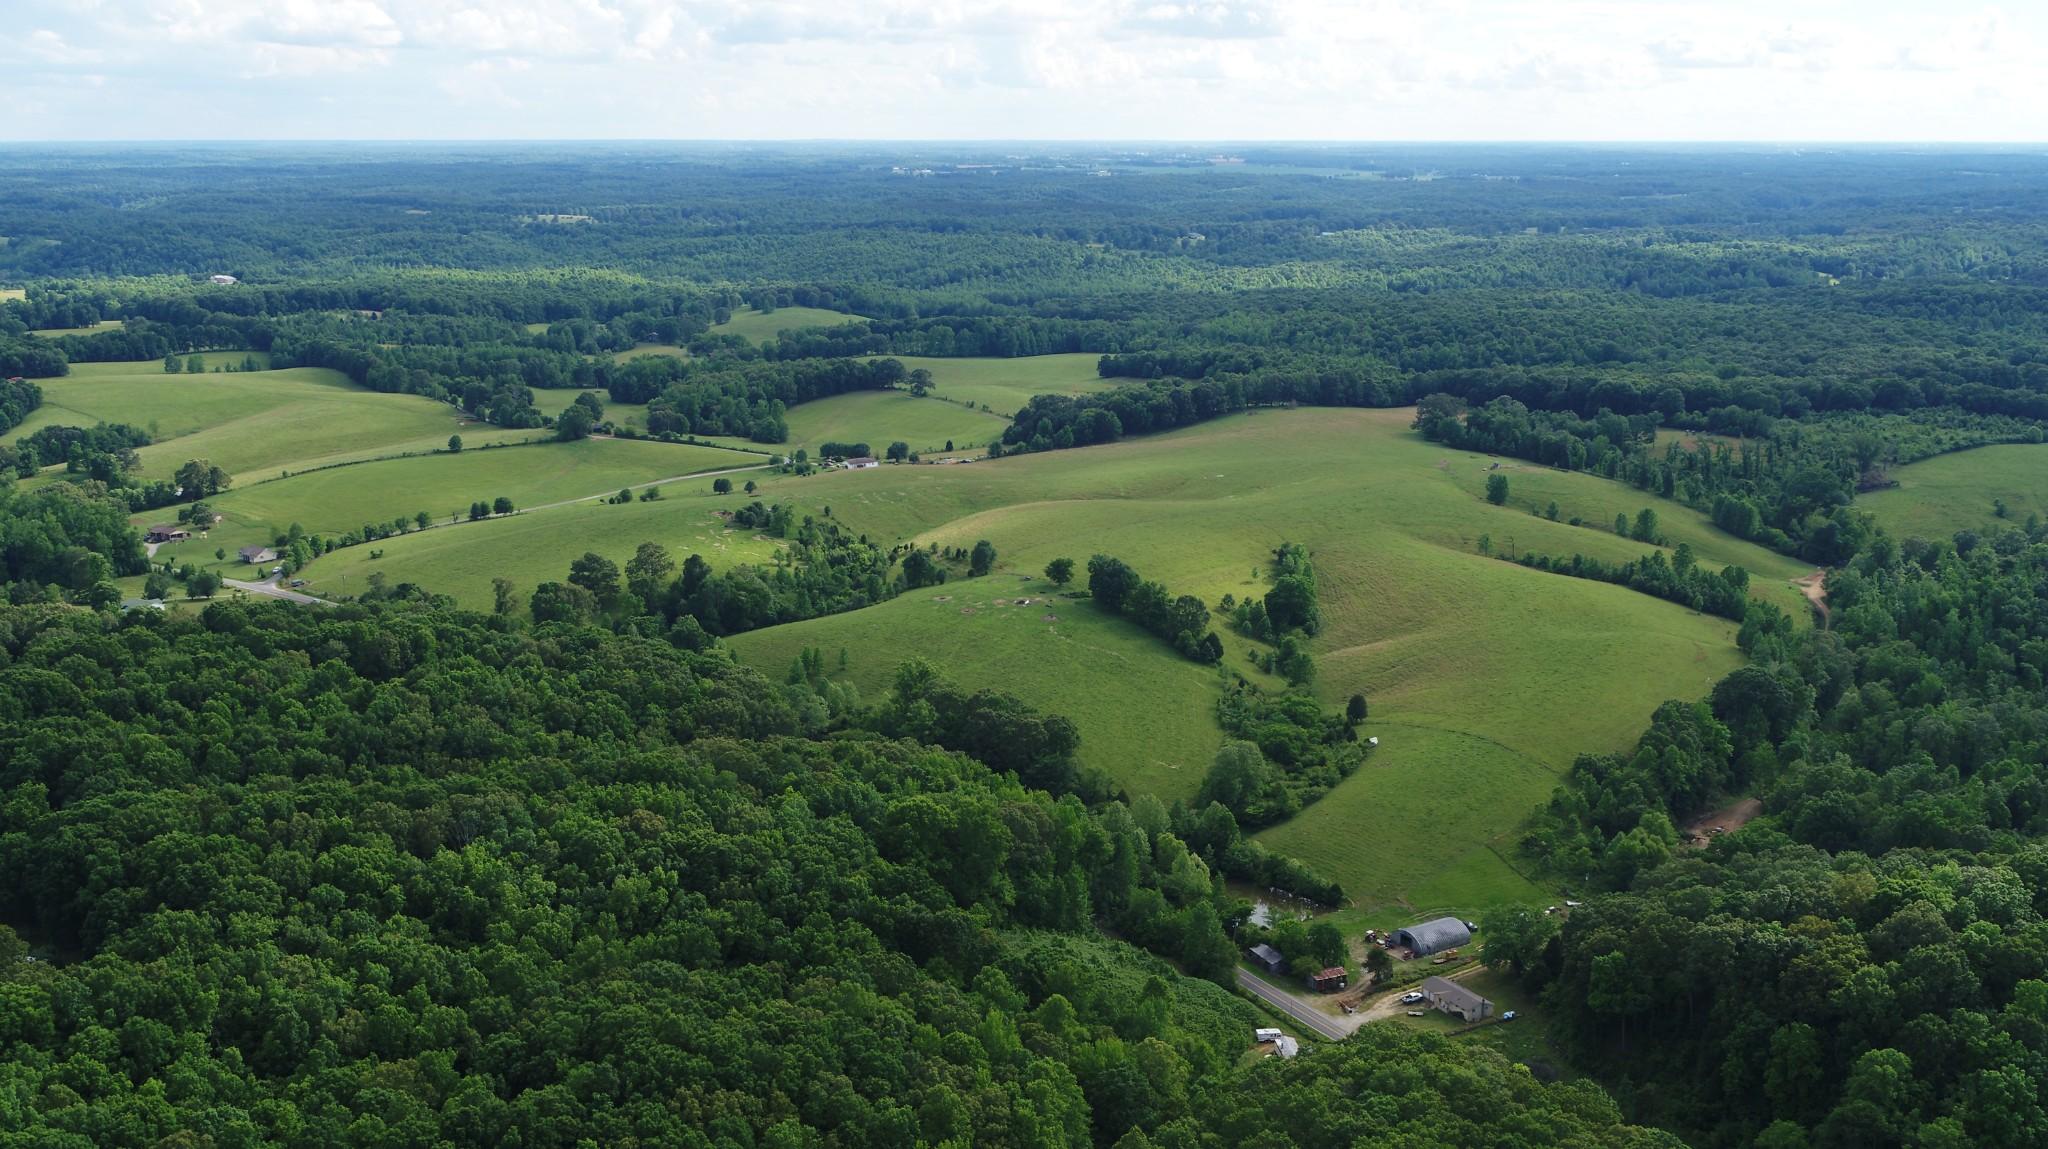 0 Enterprise Road/Tn-166 S, Mount Pleasant, TN 38474 - Mount Pleasant, TN real estate listing